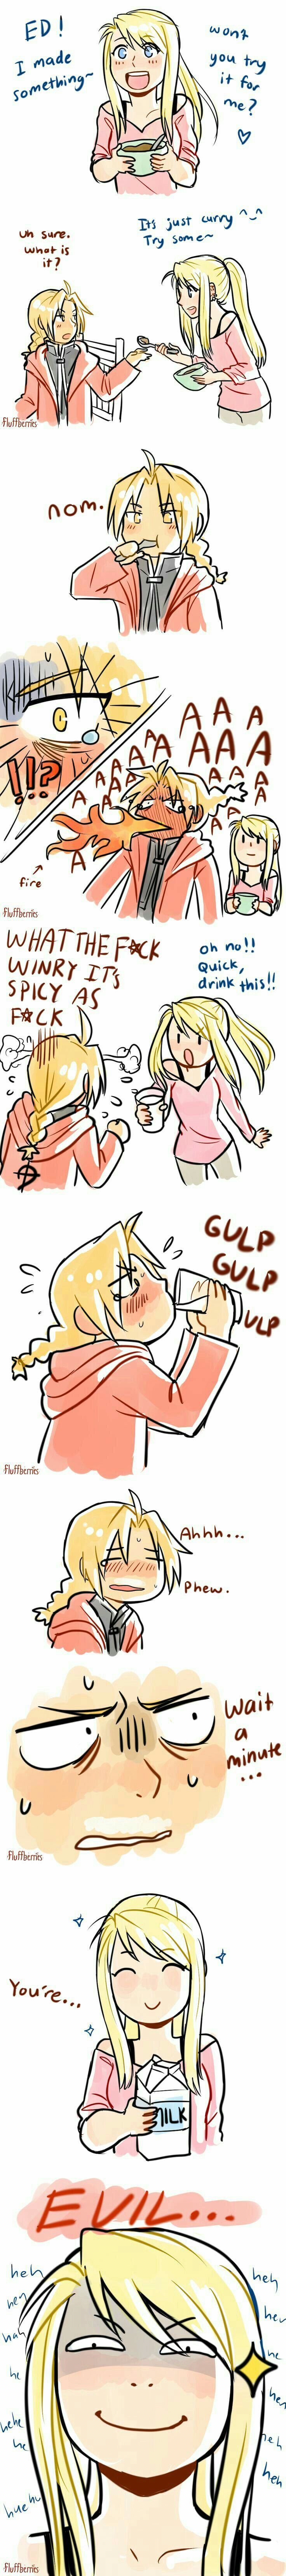 Winry, Edward, milk, funny, text, comic, curry, spicy; Fullmetal Alchemist